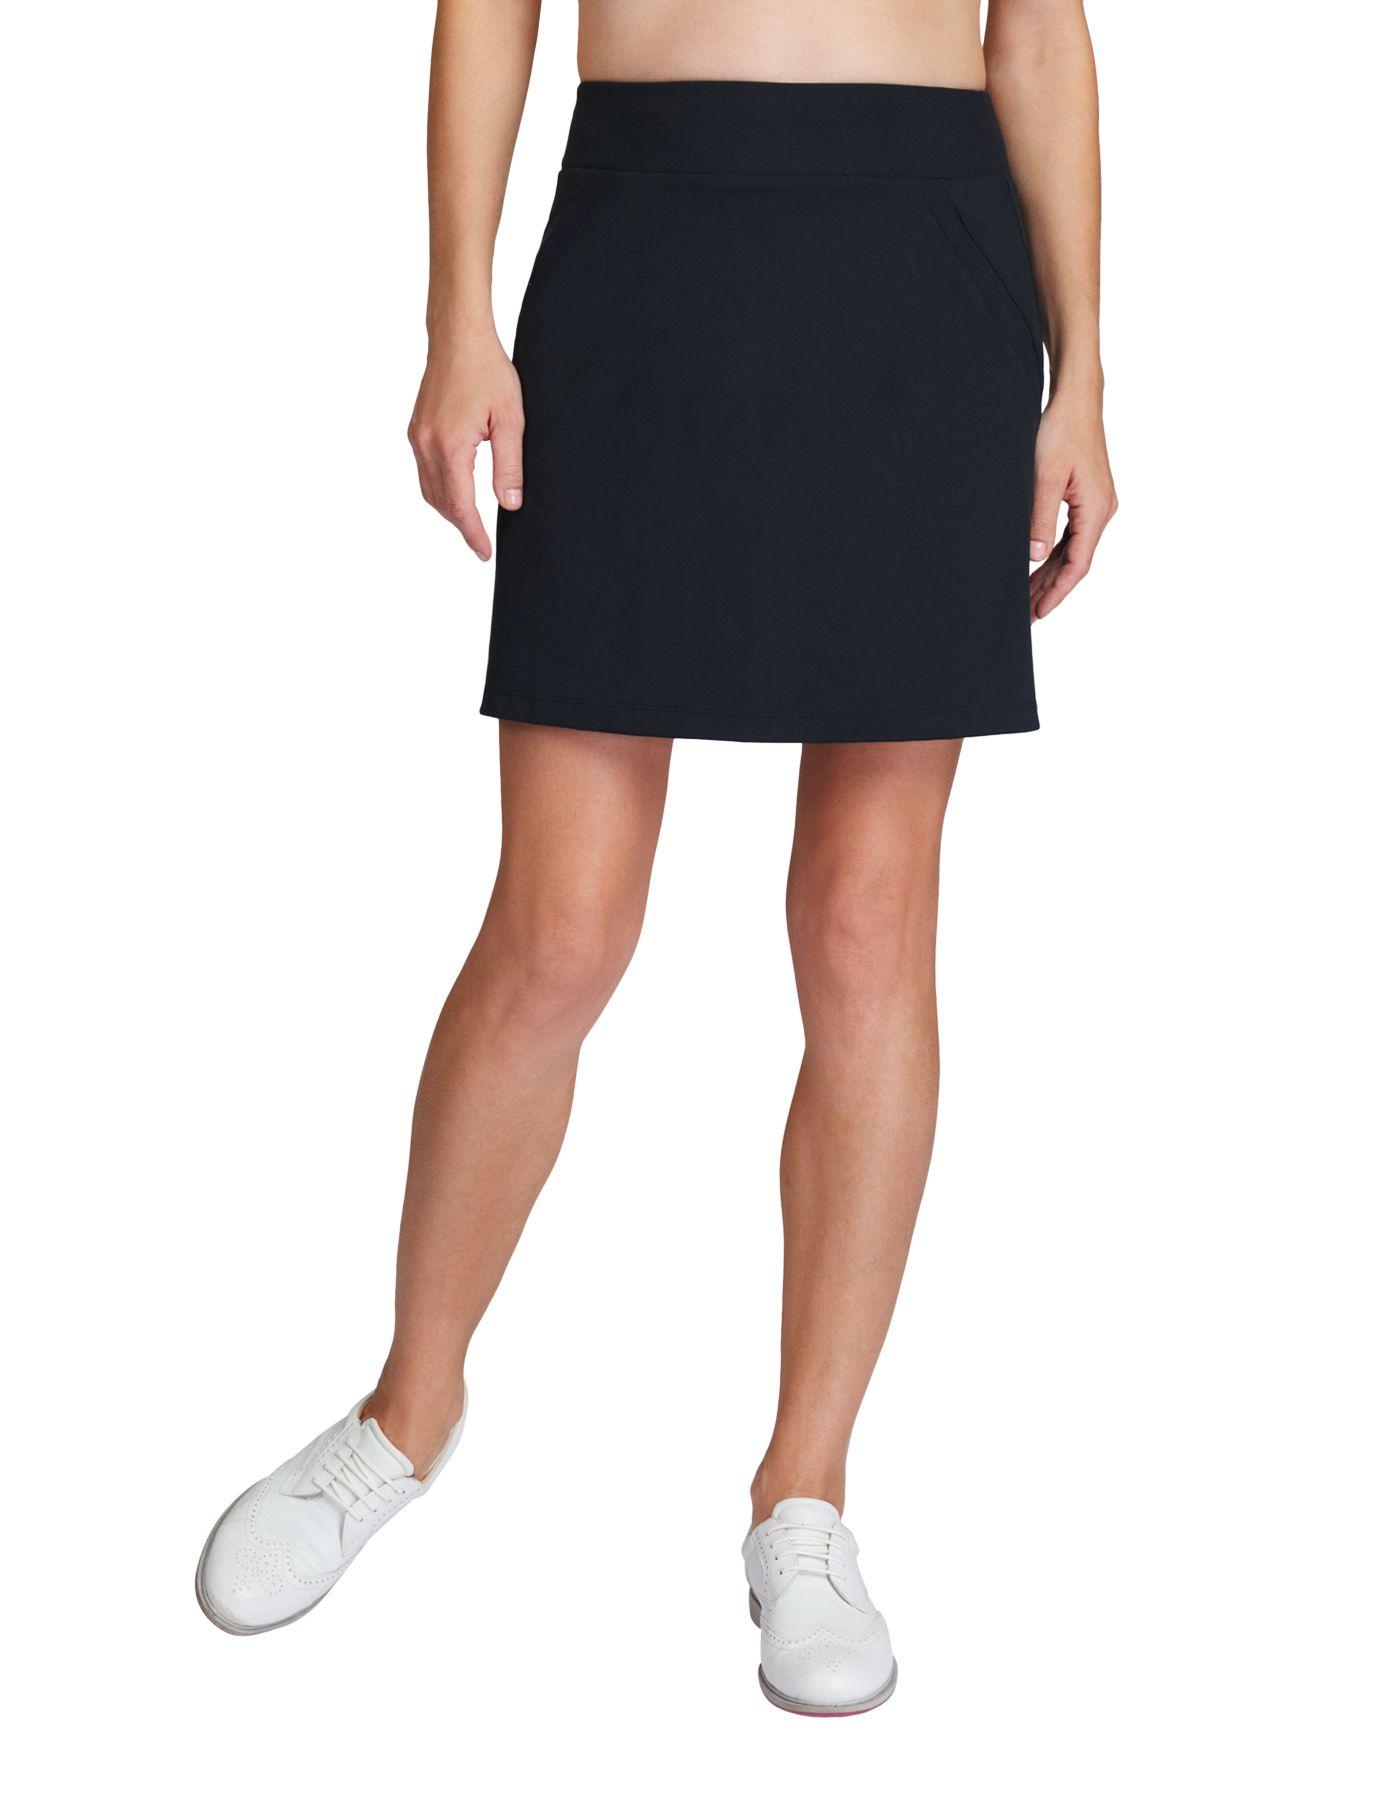 Tail Women's Comfort Knit Golf Skort - Extended Sizes